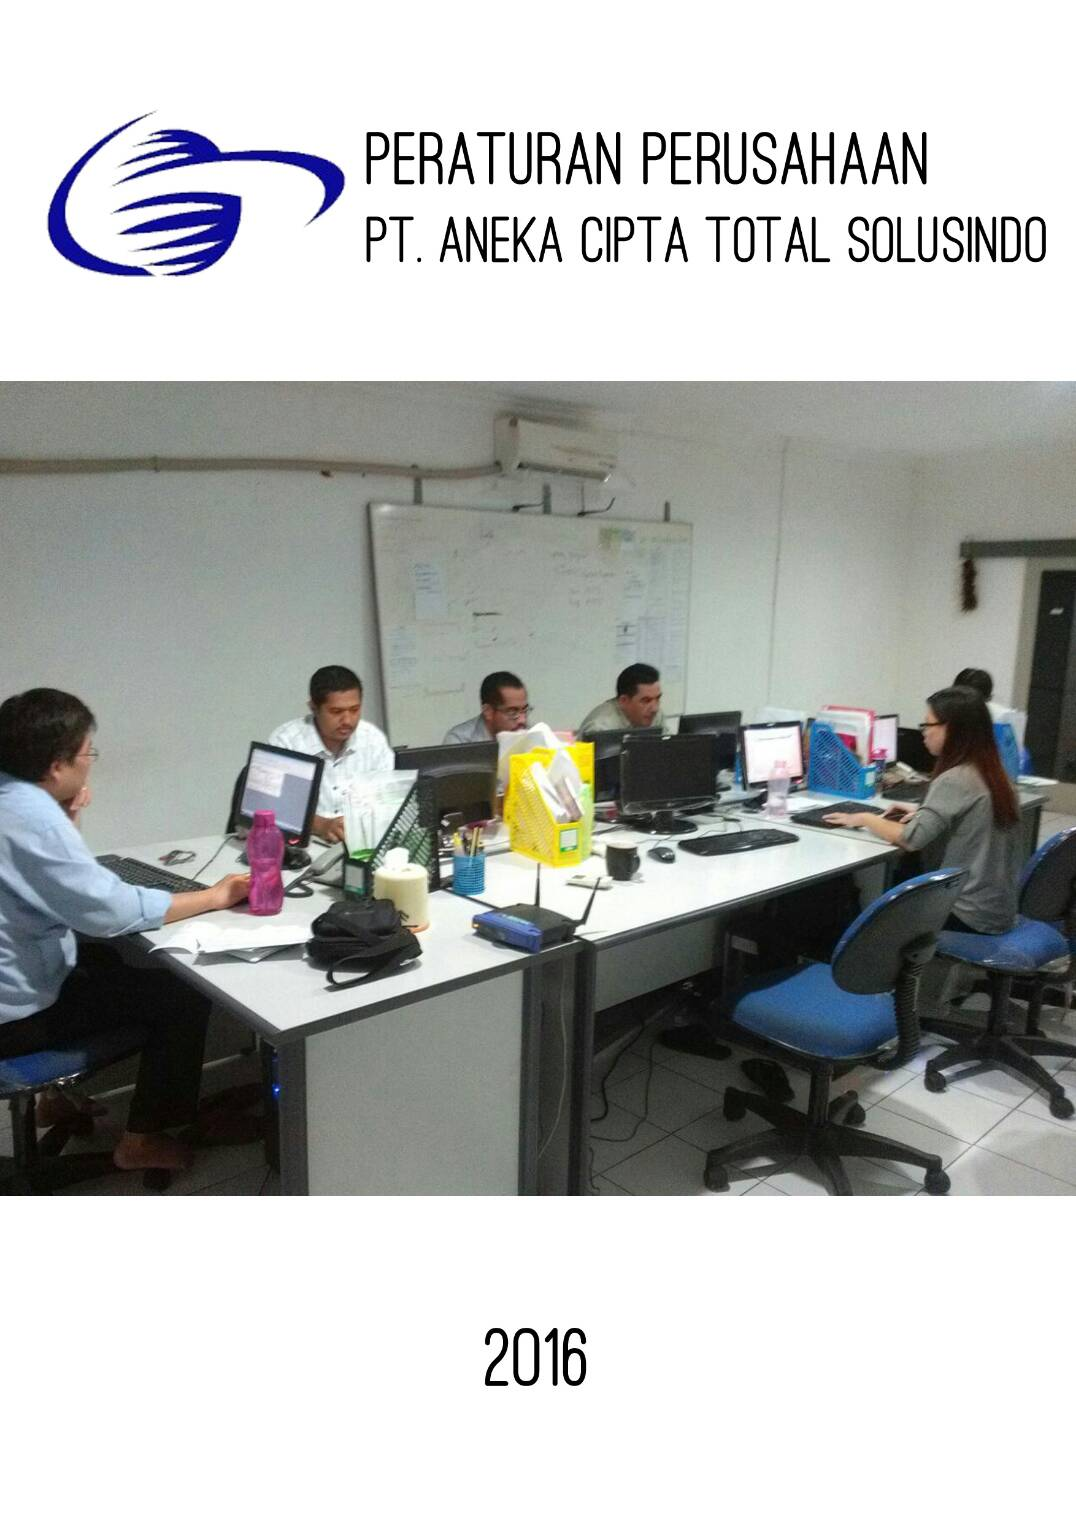 Aneka Cipta Total Solusindo PT